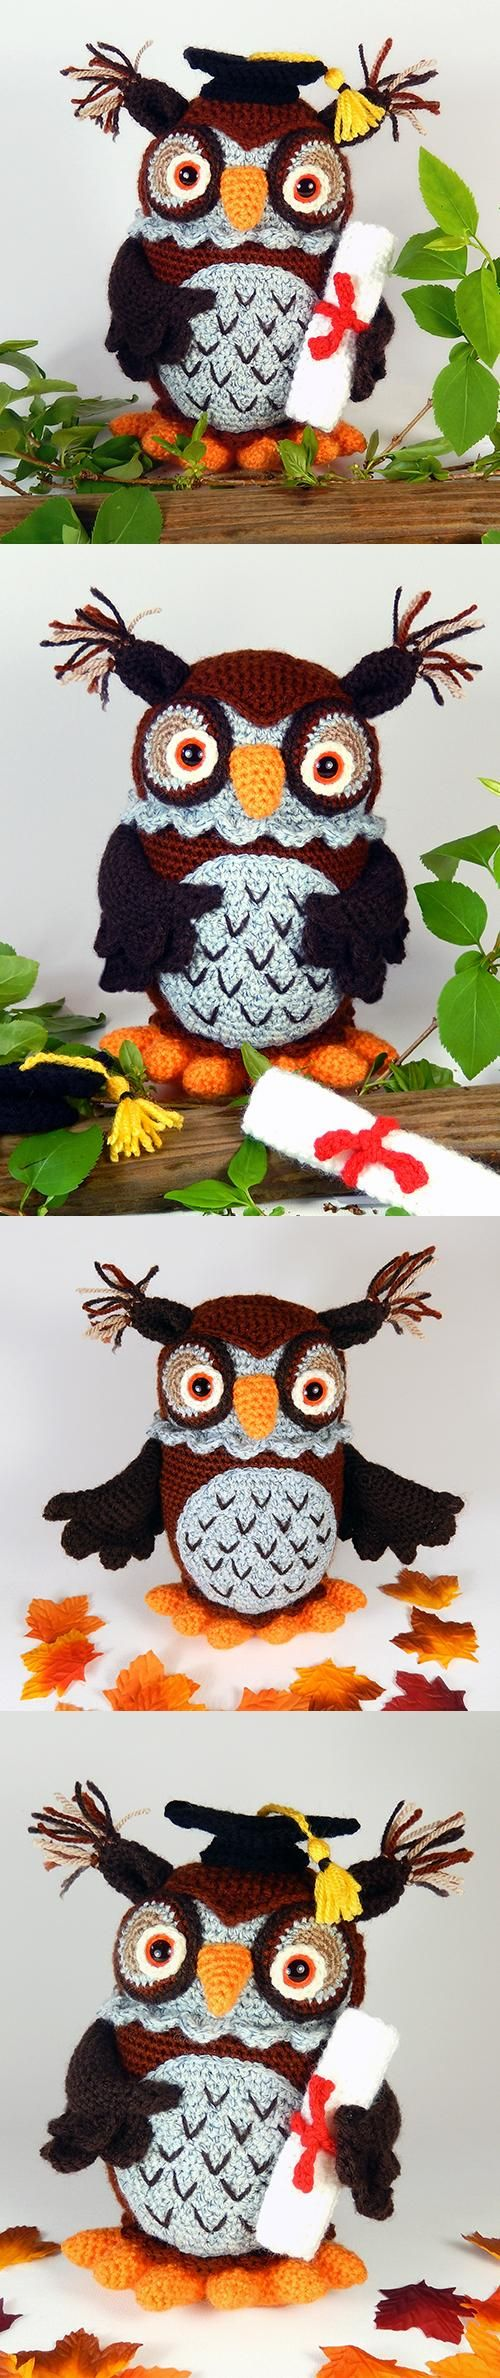 Wesley The Wise Owl Amigurumi Pattern By Janine Holmes At Mojimoji Design